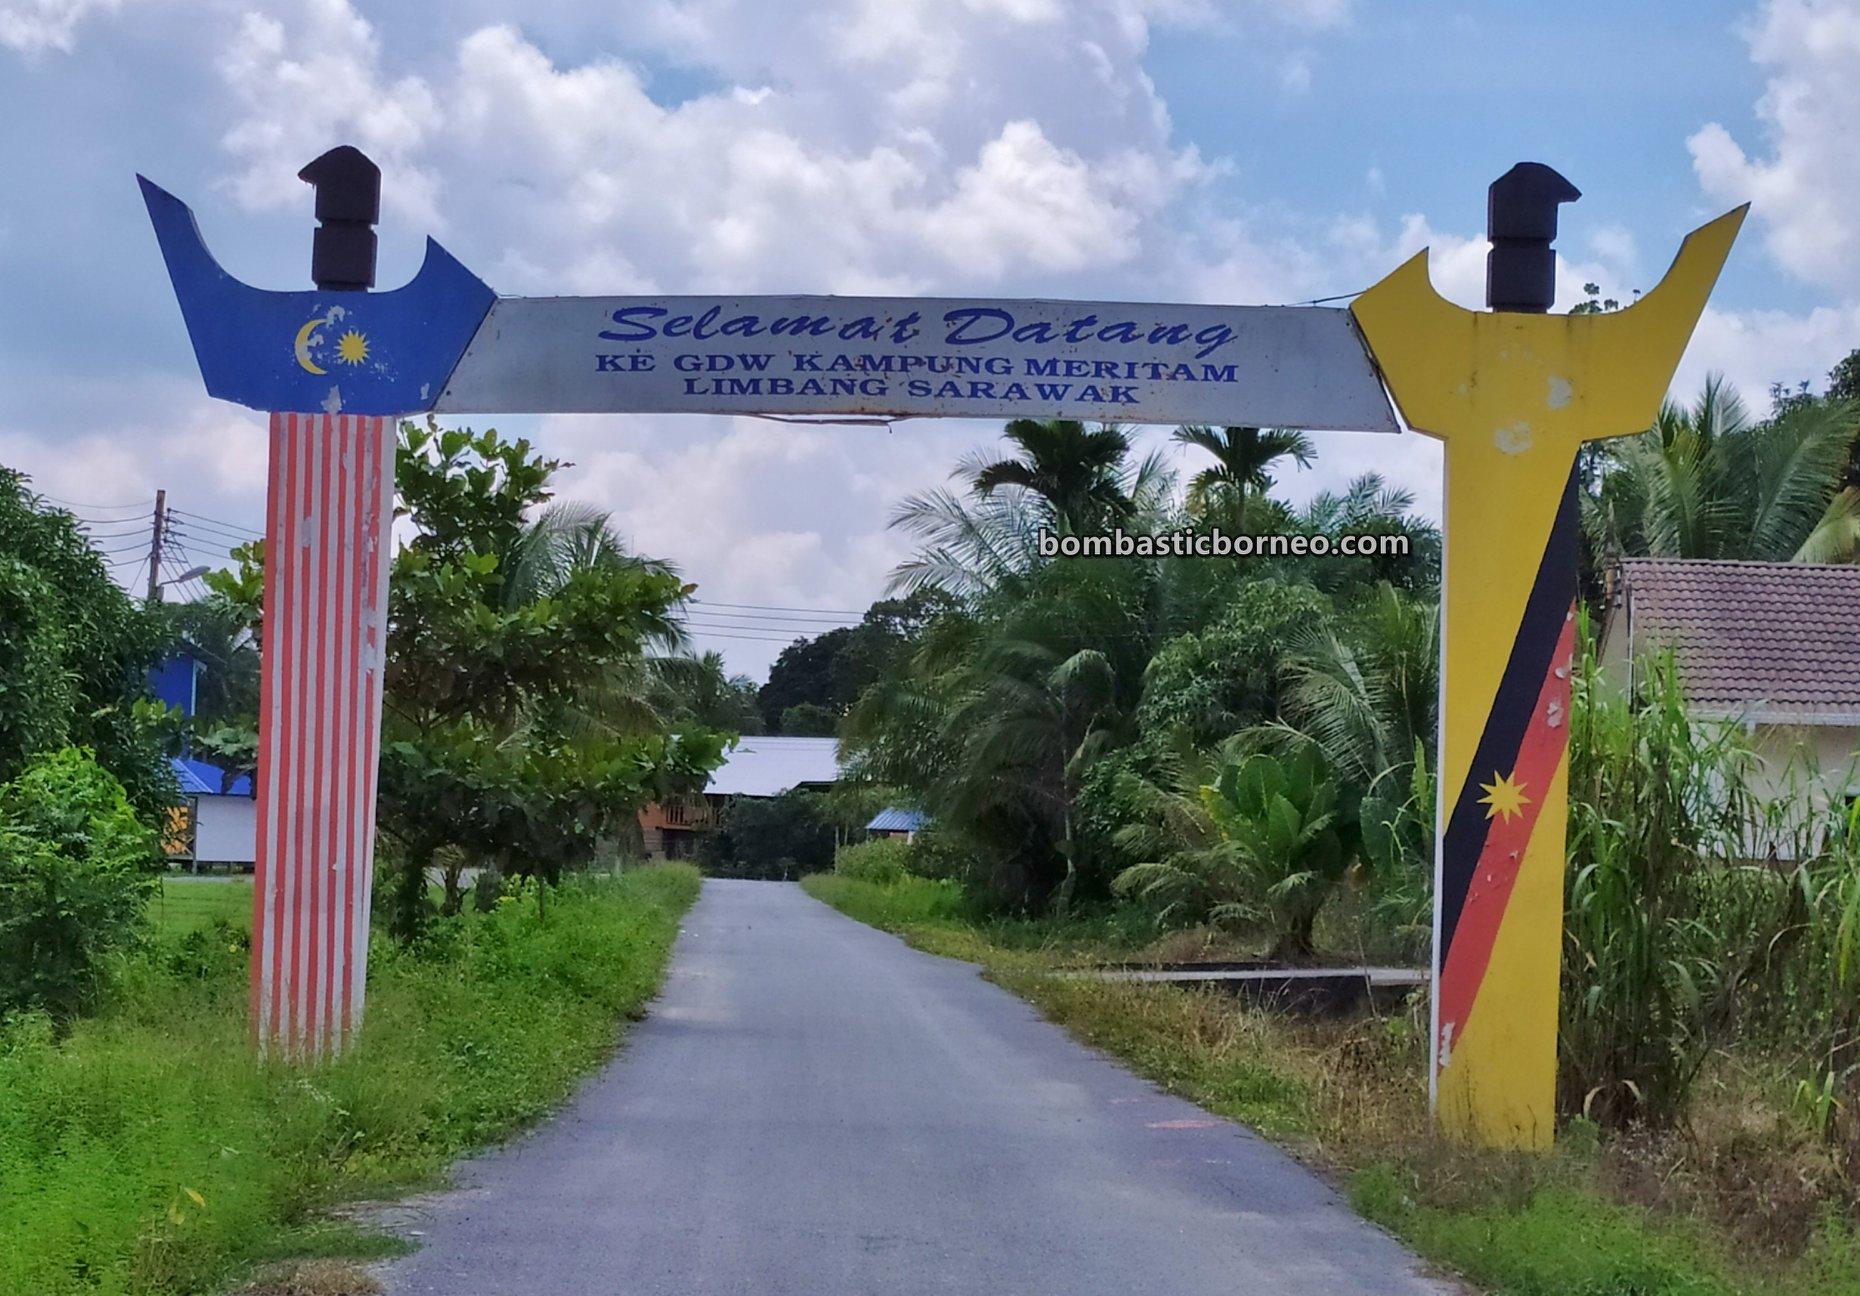 Lumpur Bebuak, Mud Volcano, Mud Pools, Malay Village, adventure, Kampung Melayu, backpackers, exploration, Tourism, tourist attraction, Borneo, 马来西亚砂拉越, 林梦泥火山旅游景点,